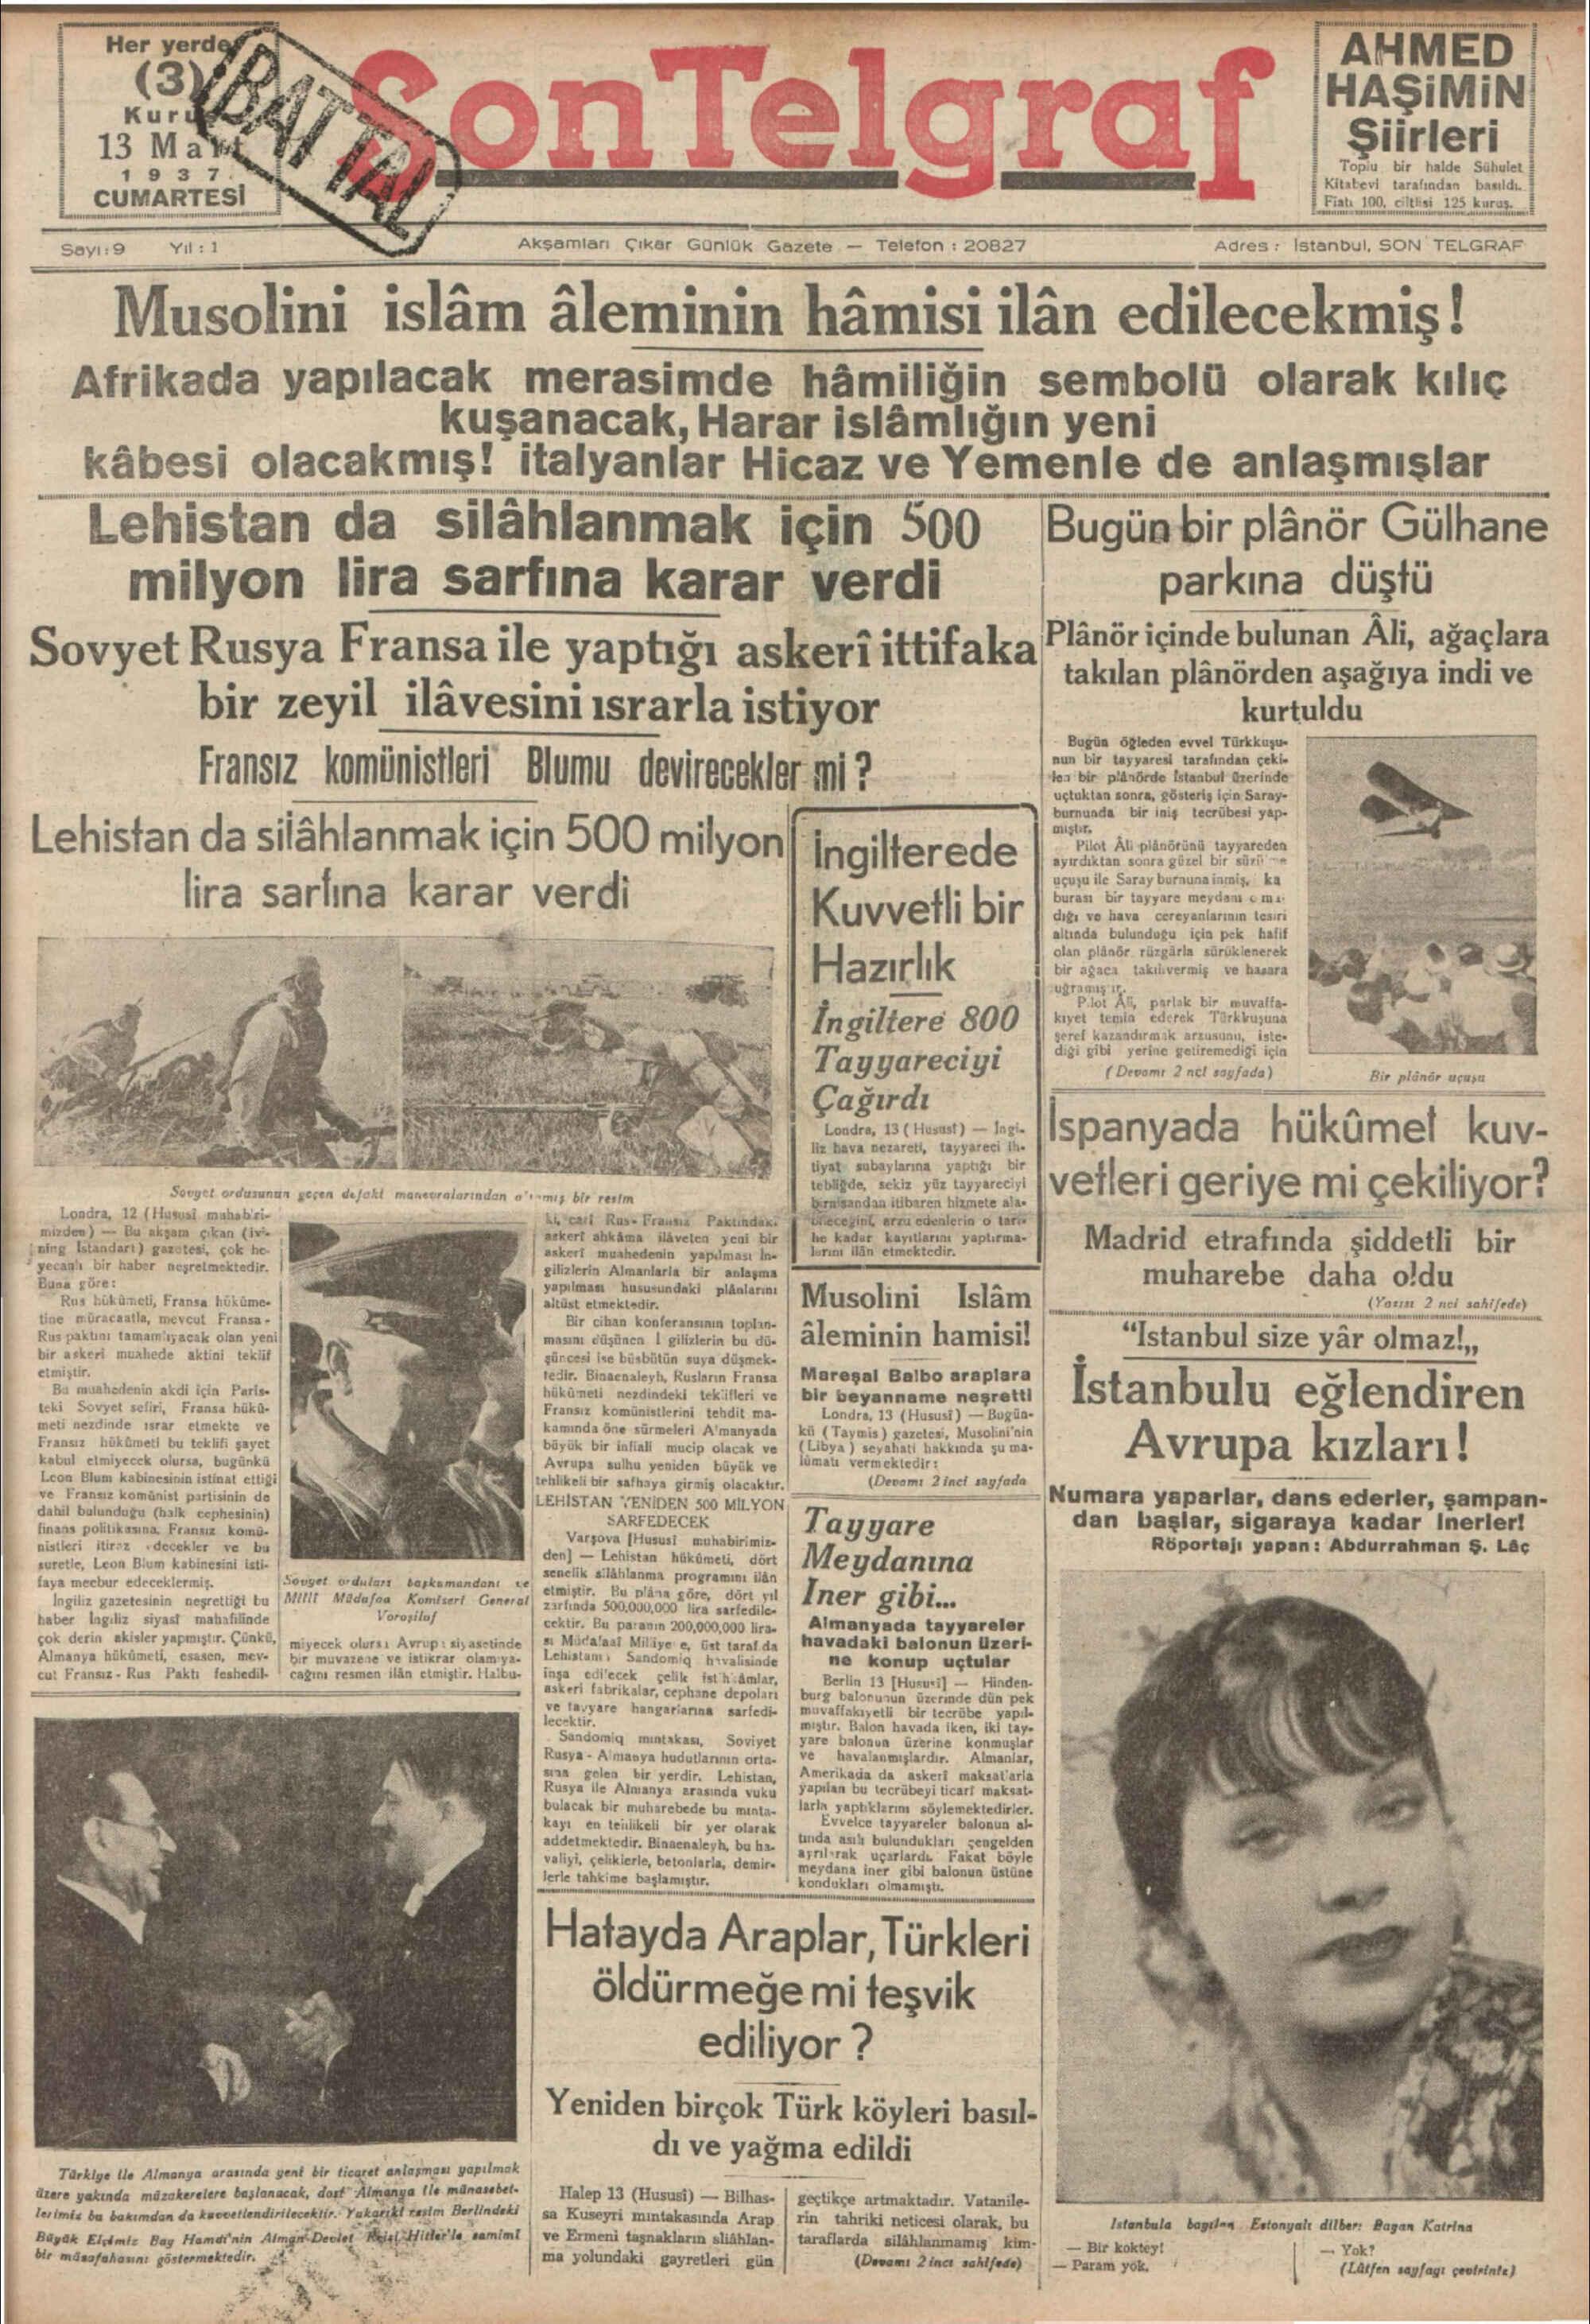 13 Mart 1937 Tarihli Son Telgraf Gazetesi Sayfa 1